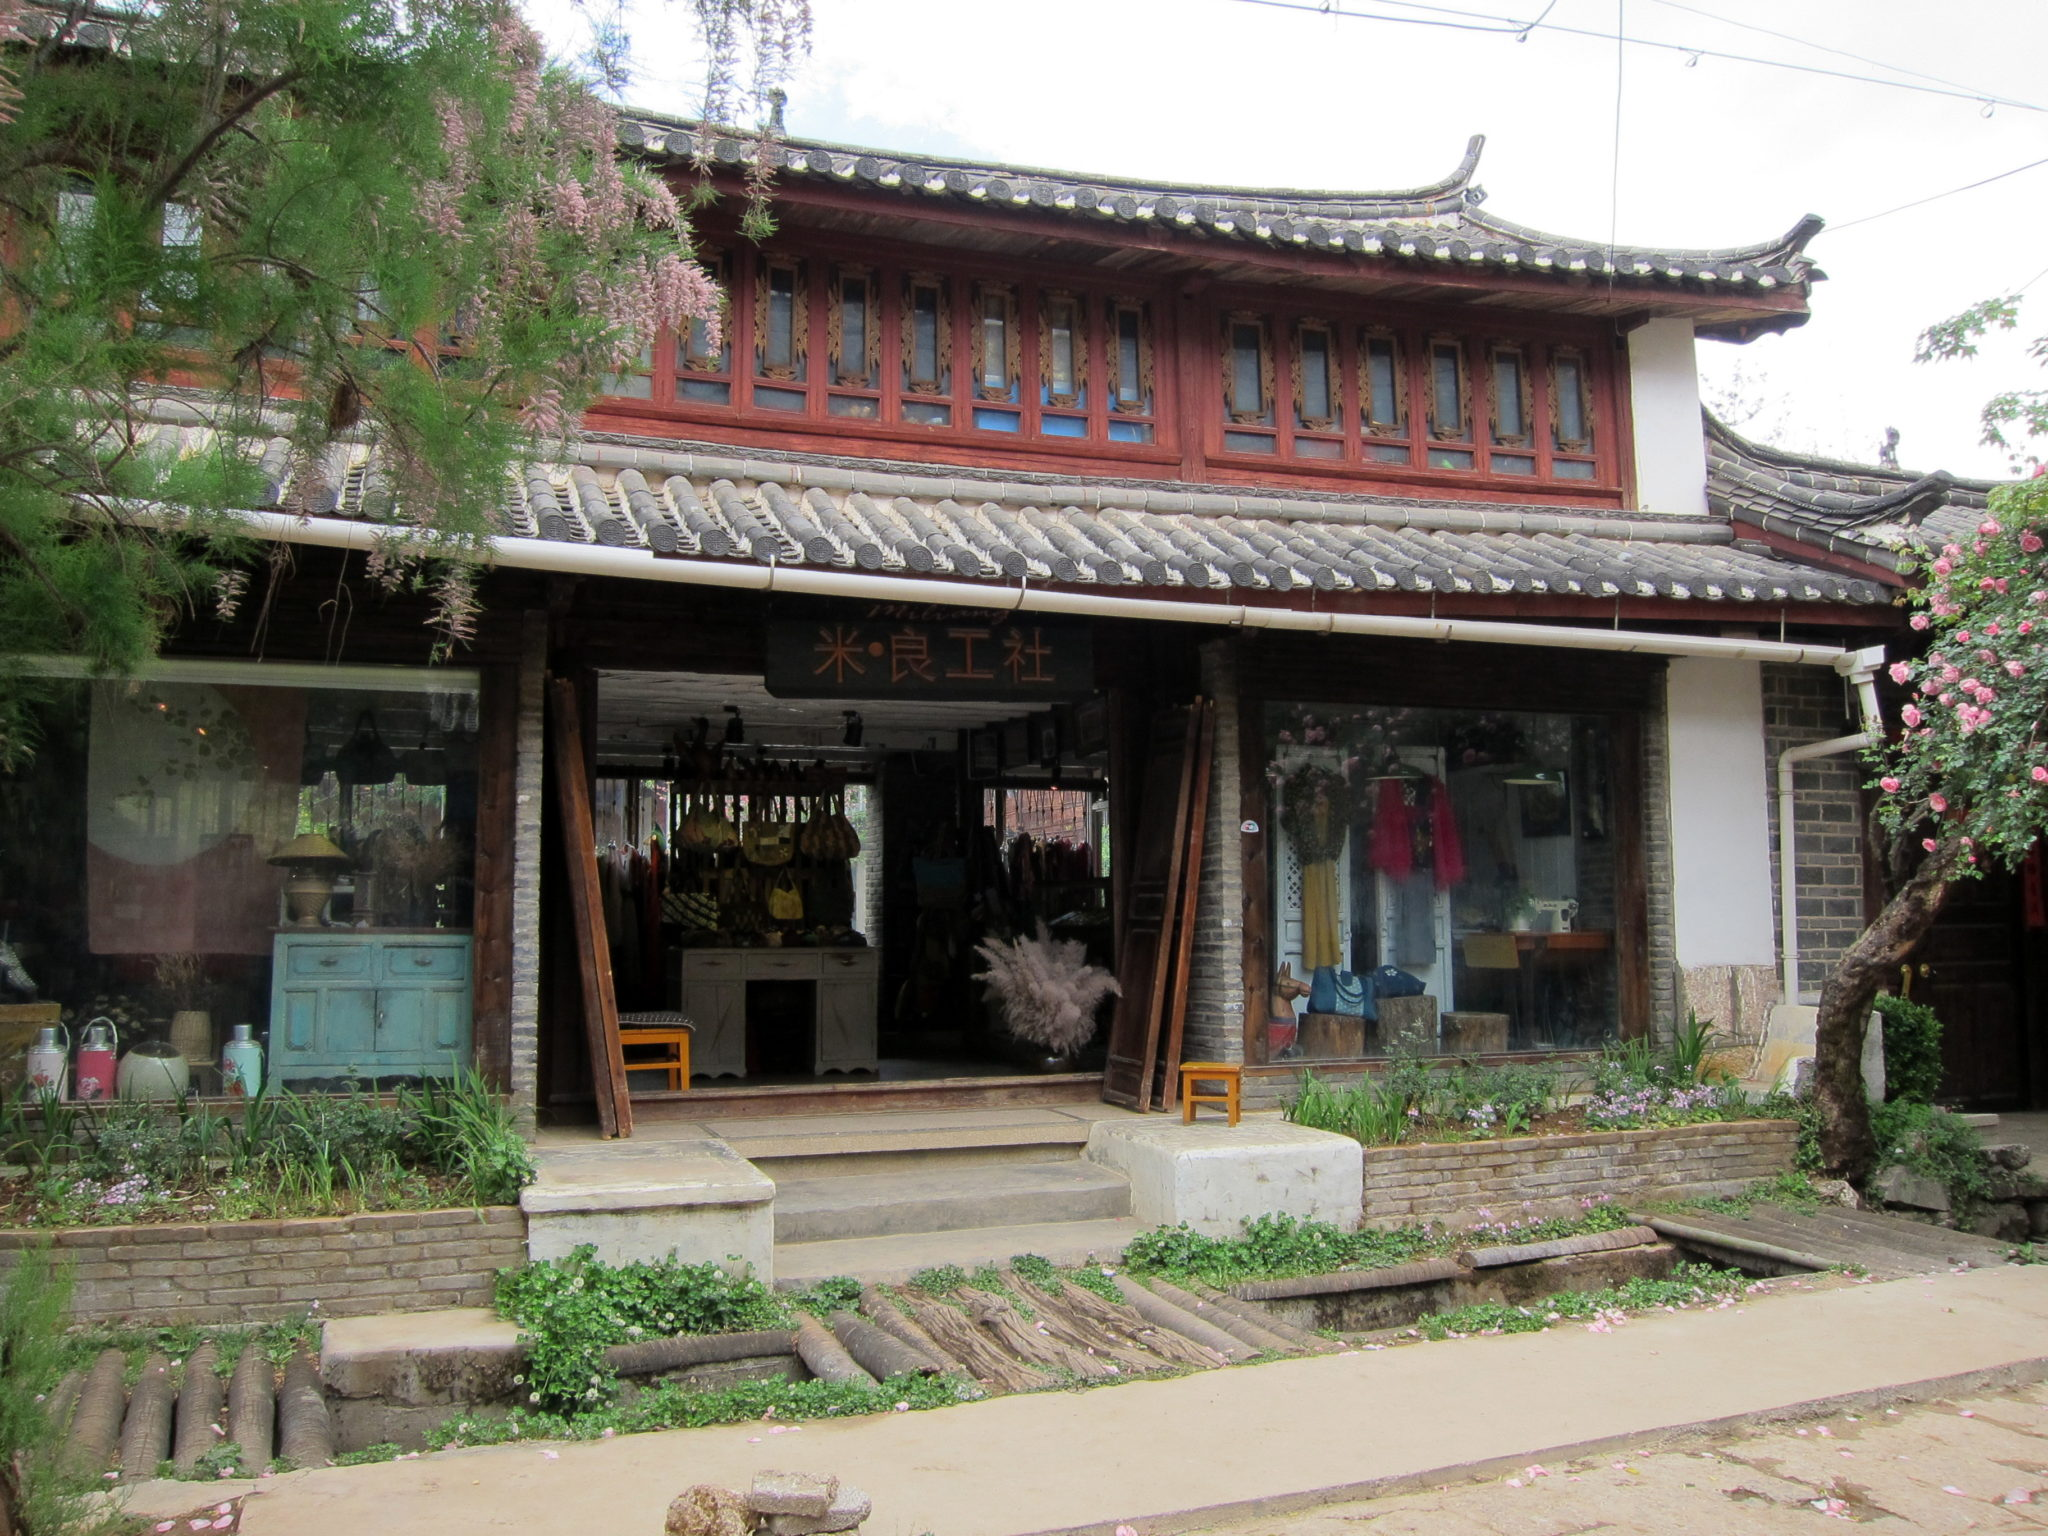 baisha village and china u0027s famous medicine man ferreting out the fun